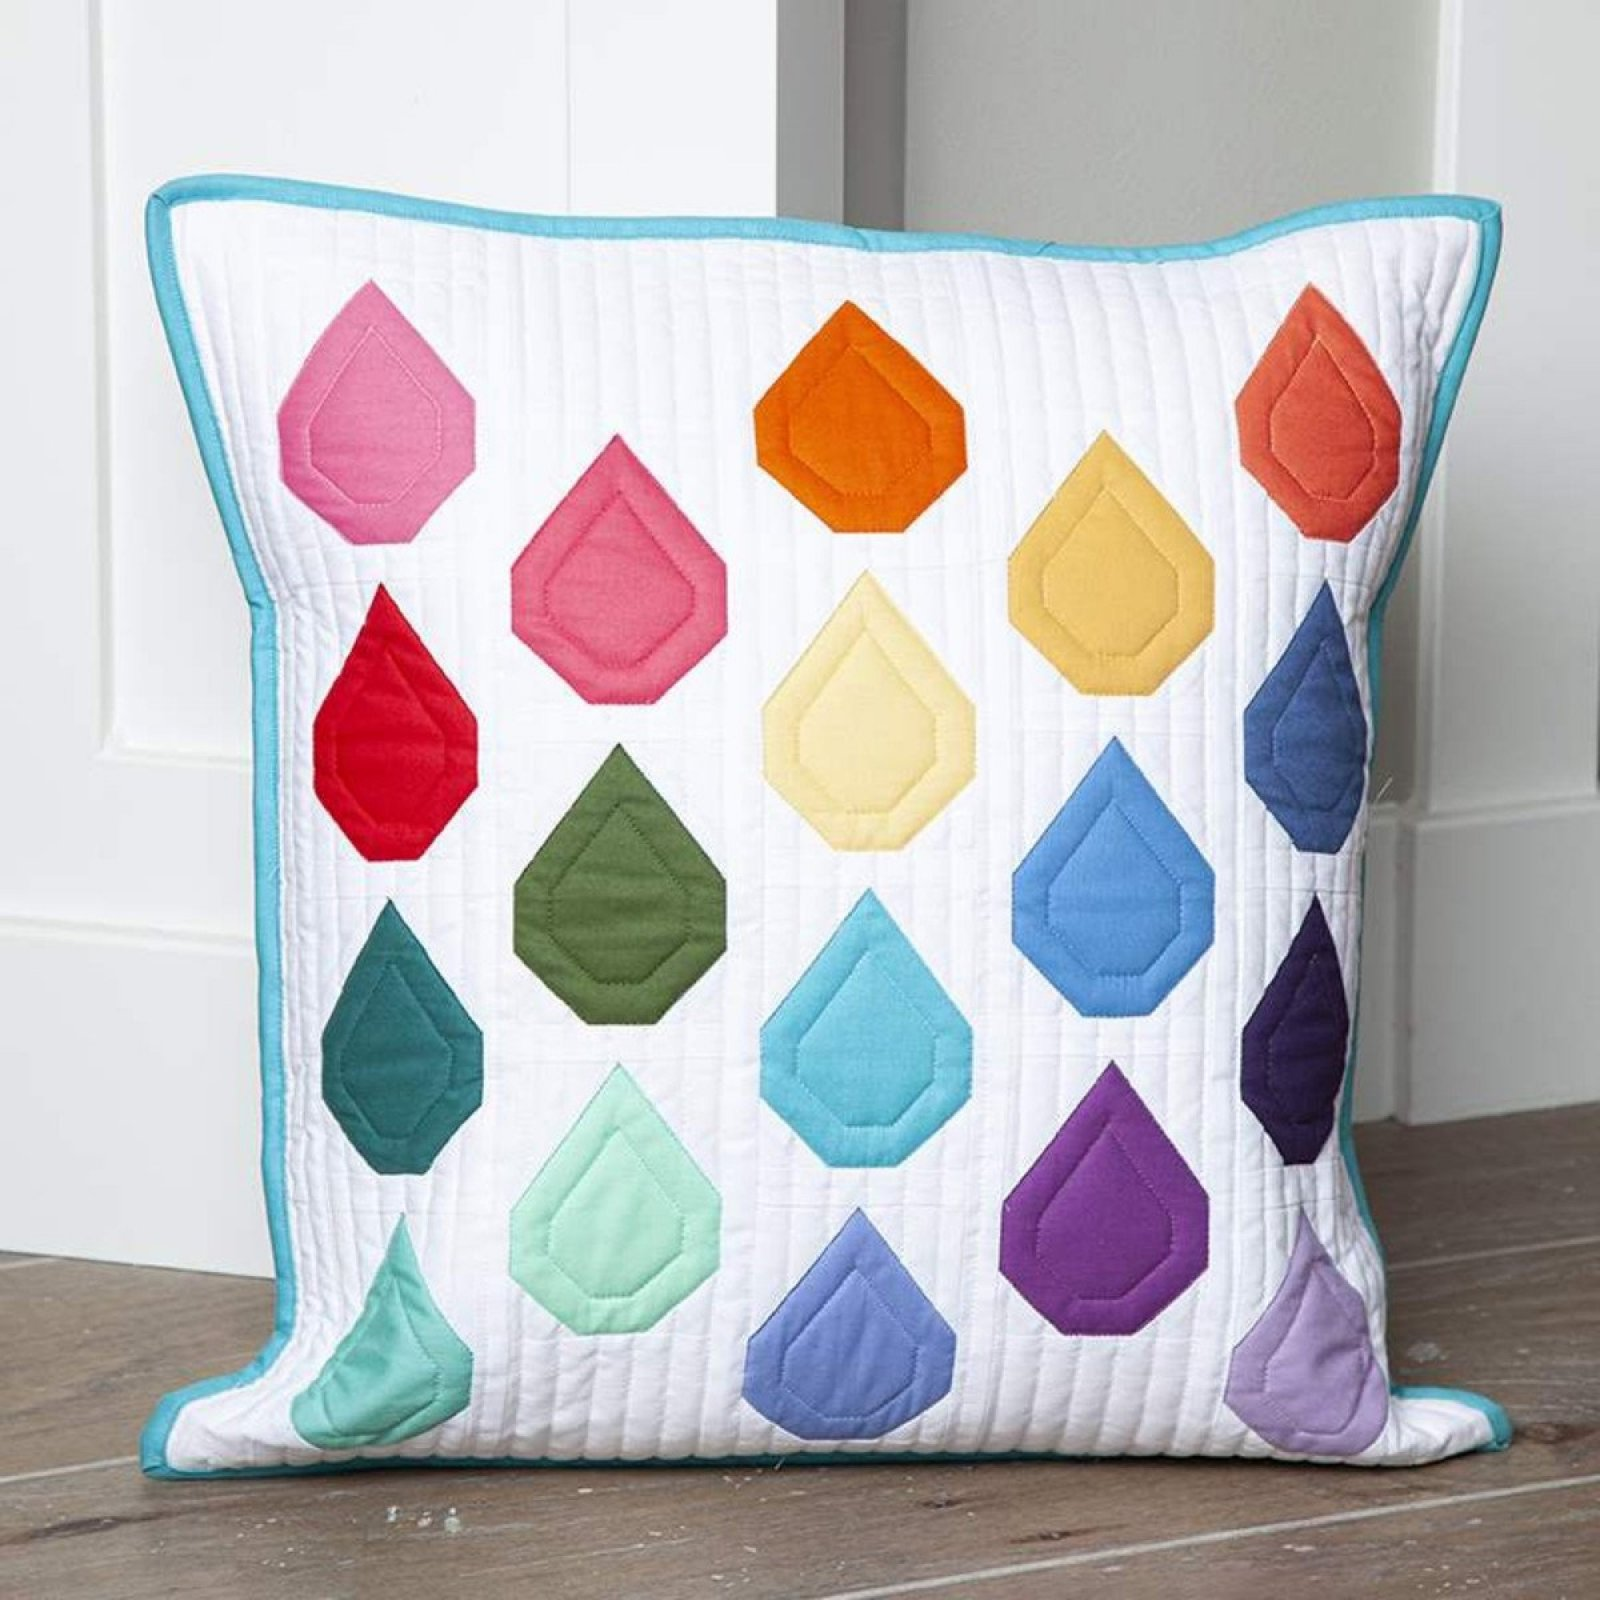 Riley Blake - 2021 Pillow Kit of the Month - April - Raindrops